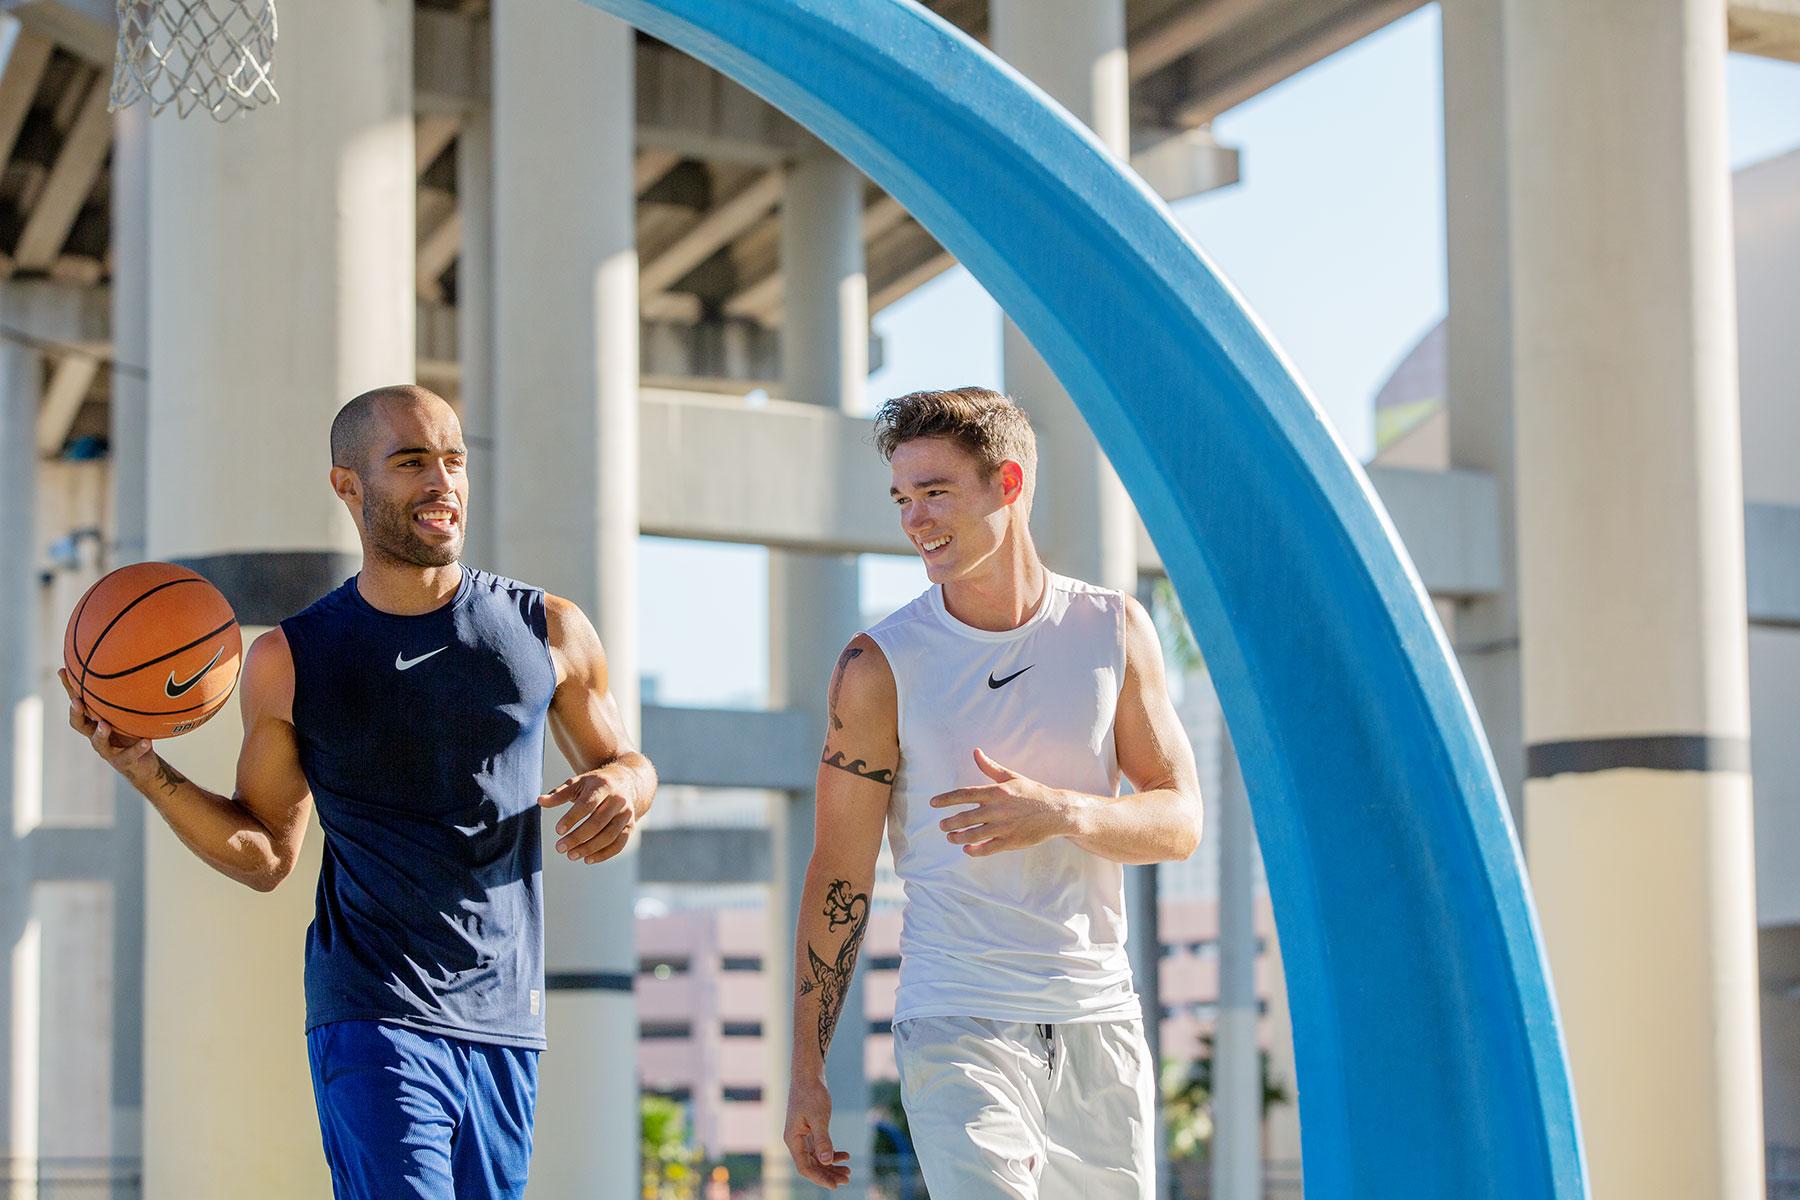 Fitness_workout_boys_playing_basketball_miami_portrait_david_gonzalez_photographer.jpg